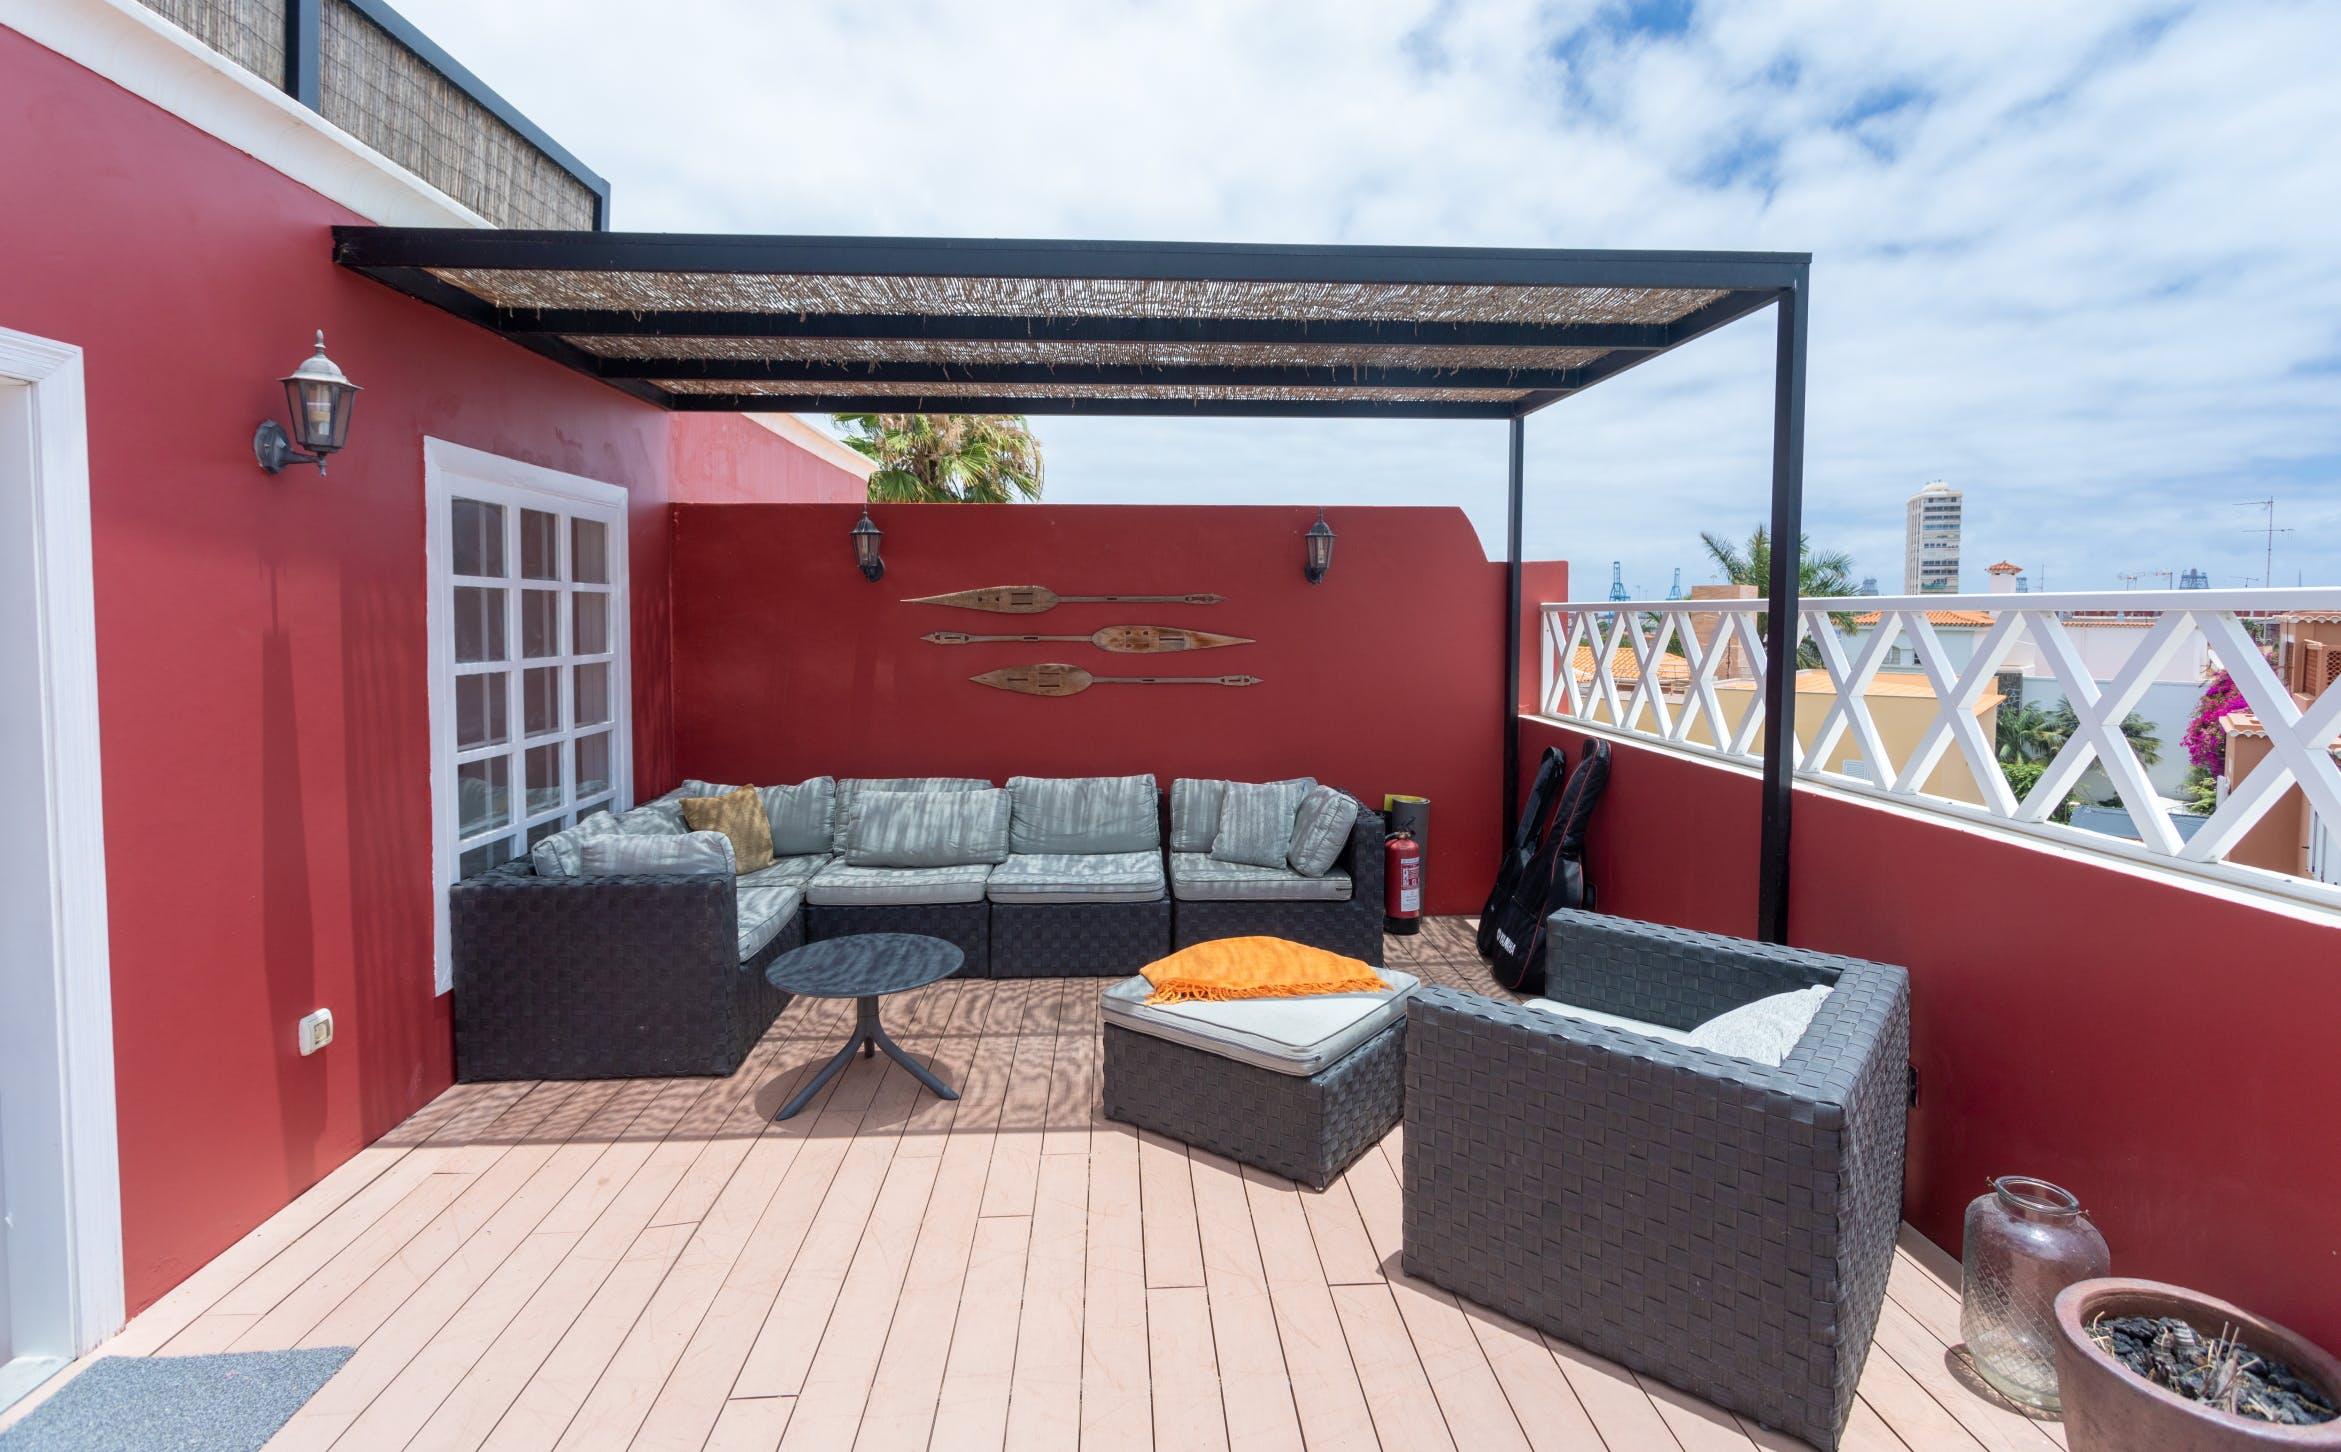 10 Residents | Ciudad Jardín |  20th Century Bright Renovated Complex w/ Workspace + Terrace